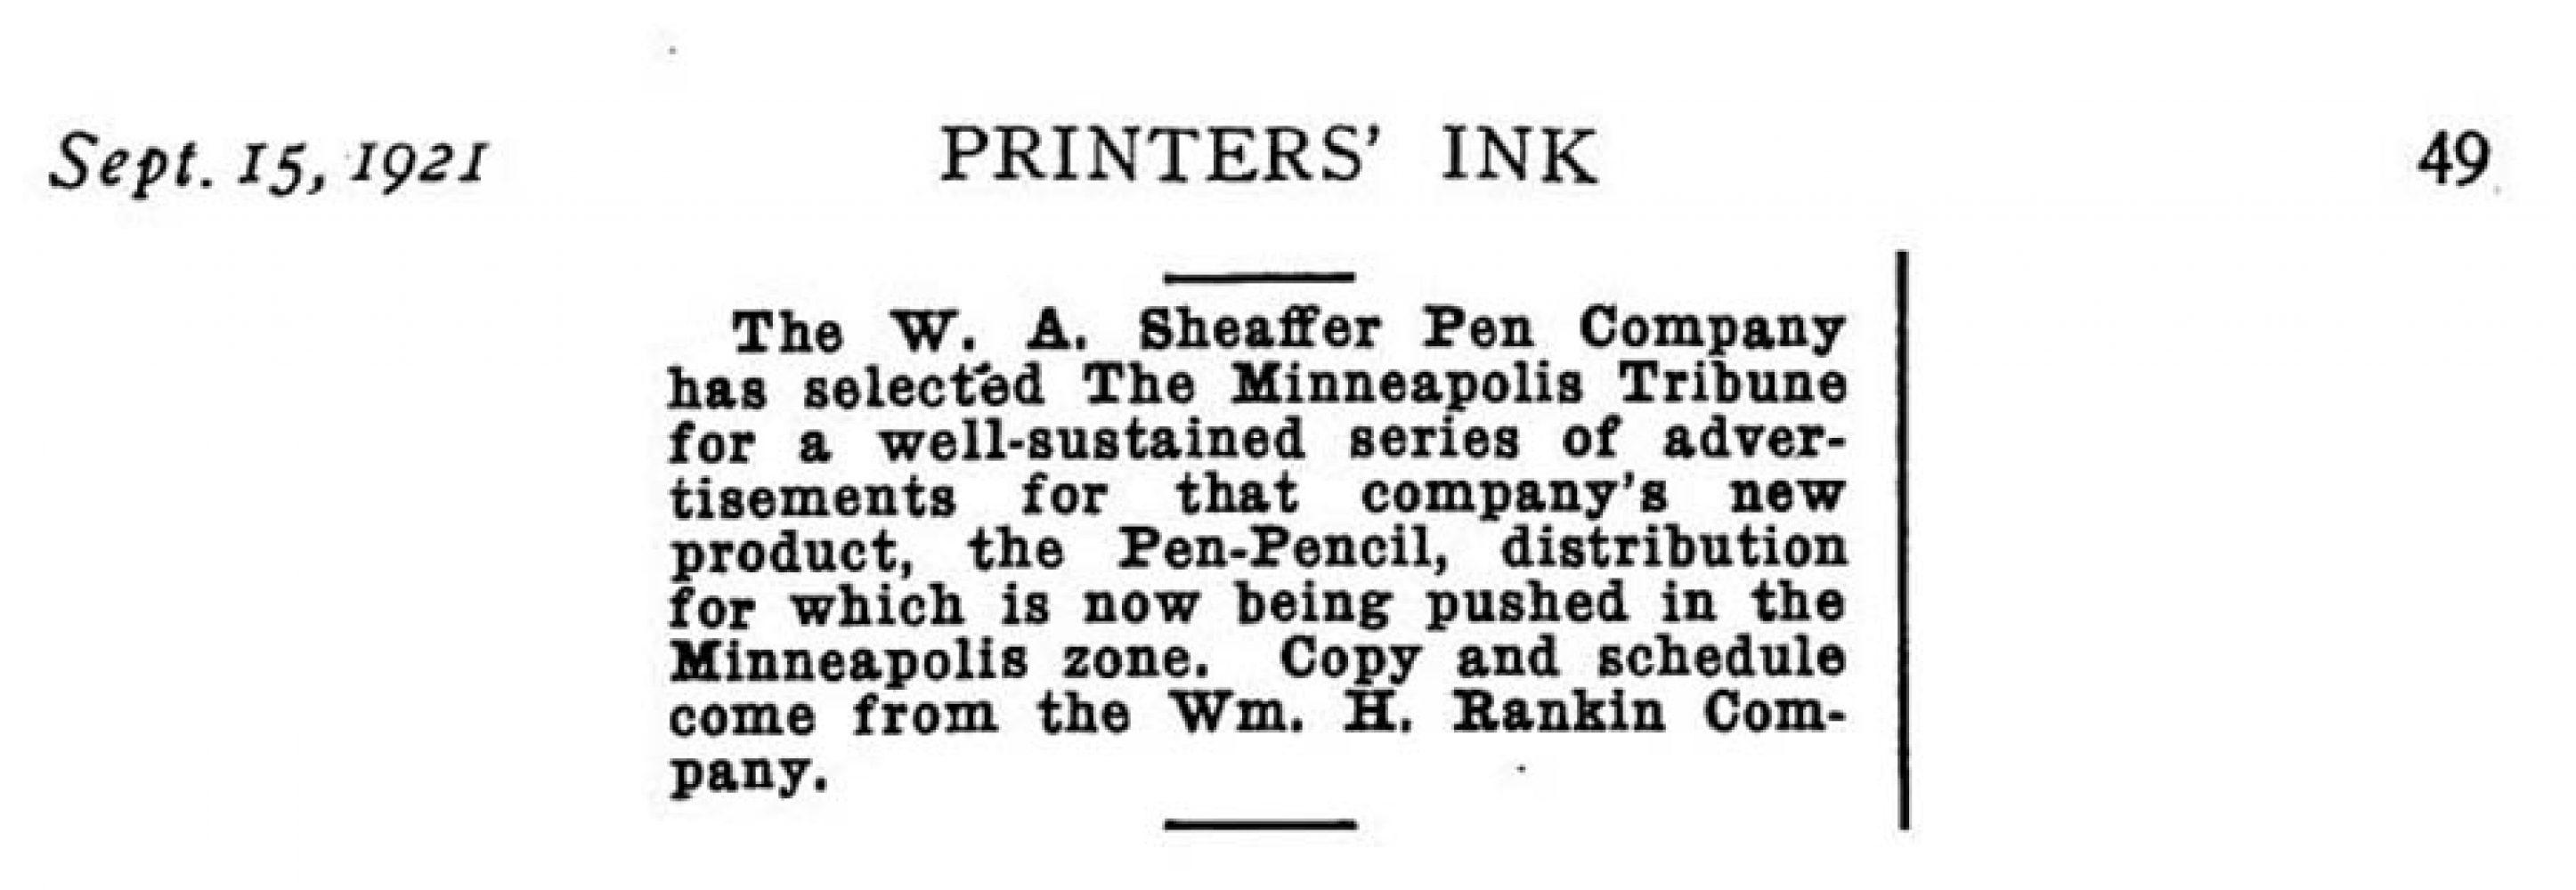 1921 09 15 Minneapolis Tribune